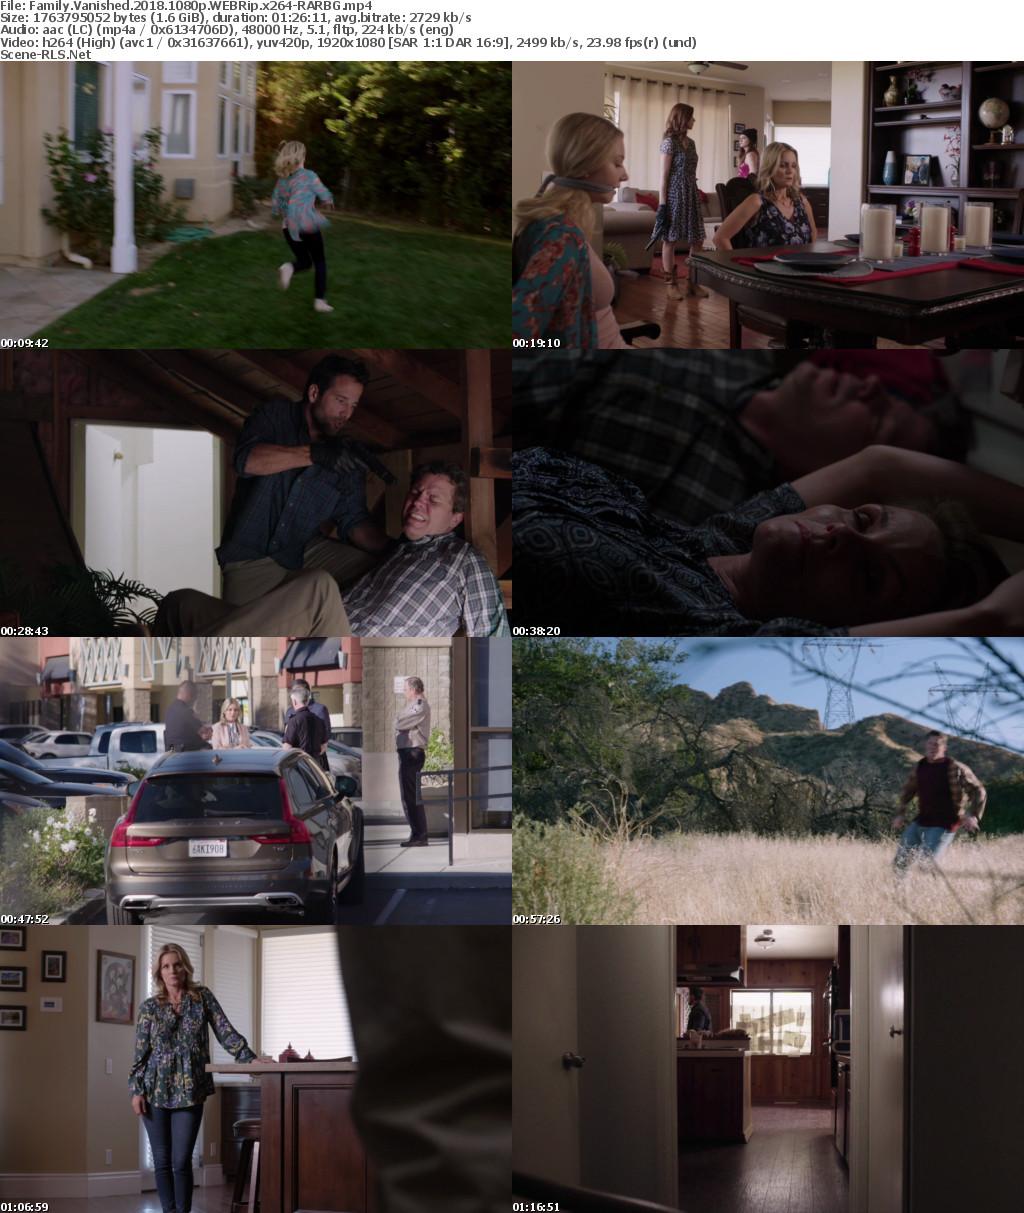 Family Vanished 2018 1080p WEBRip x264-RARBG - Scene Release